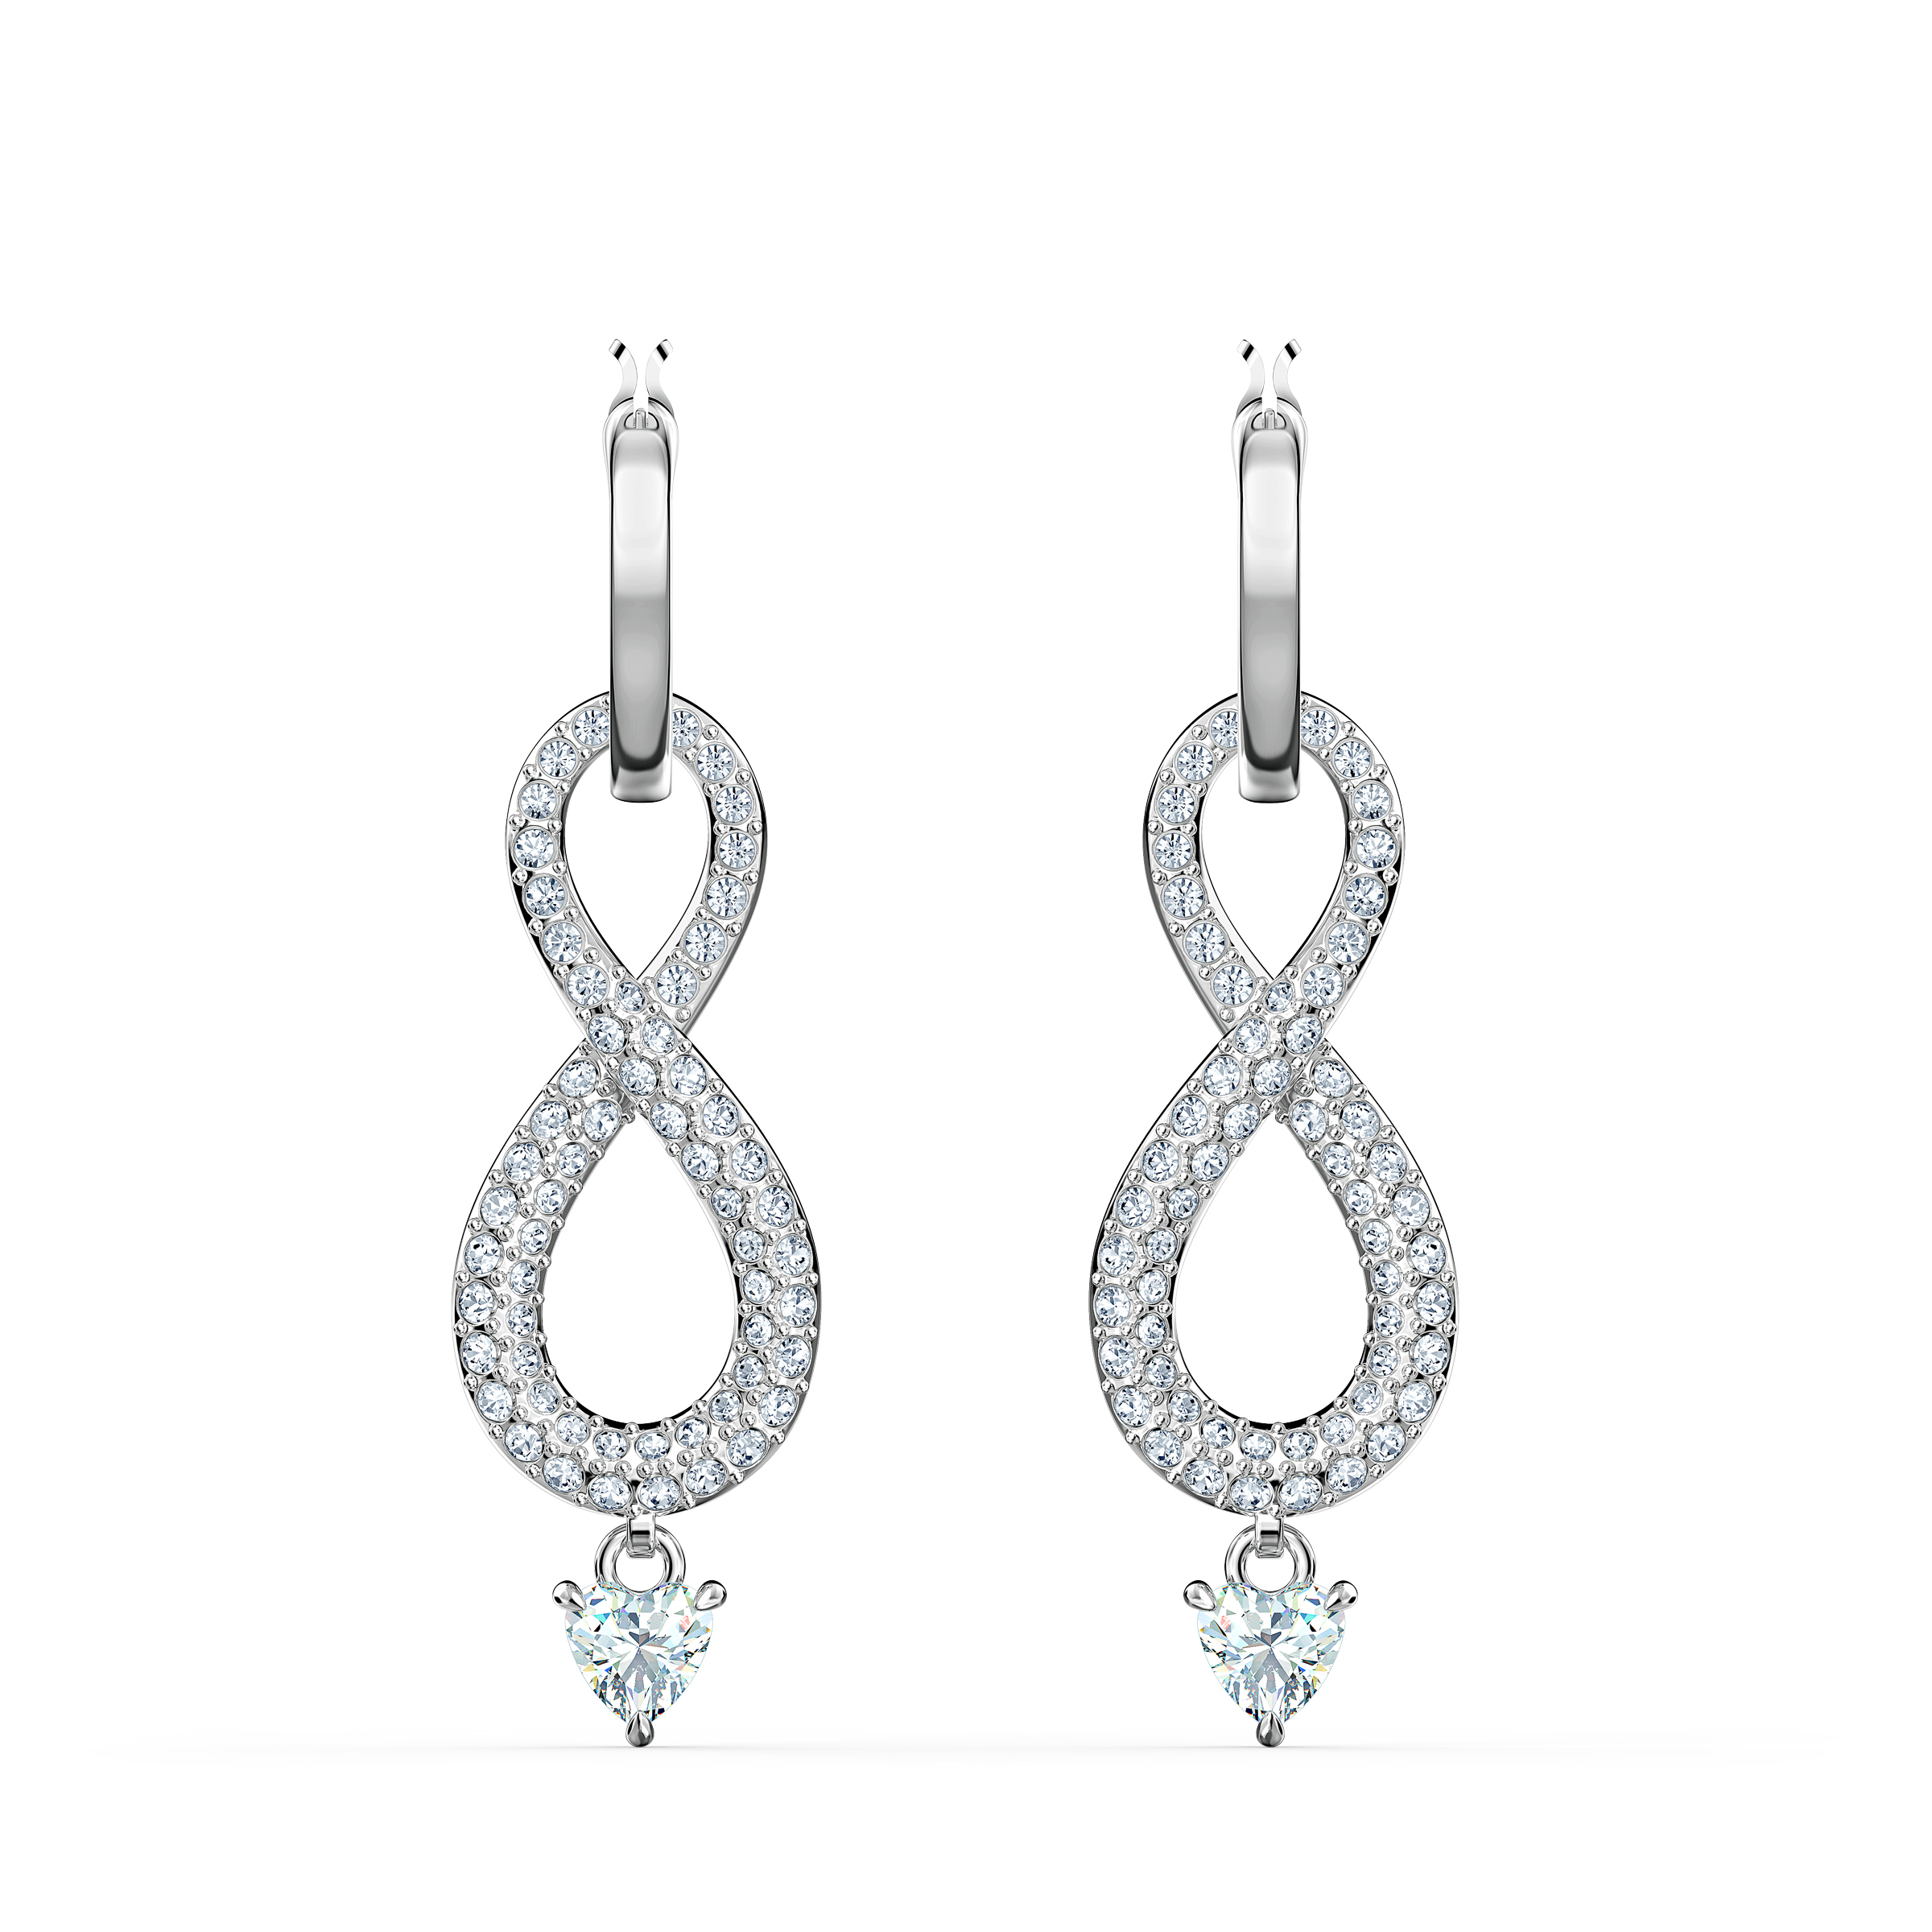 Boucles d'oreilles Swarovski Infinity, blanc, métal rhodié, Swarovski